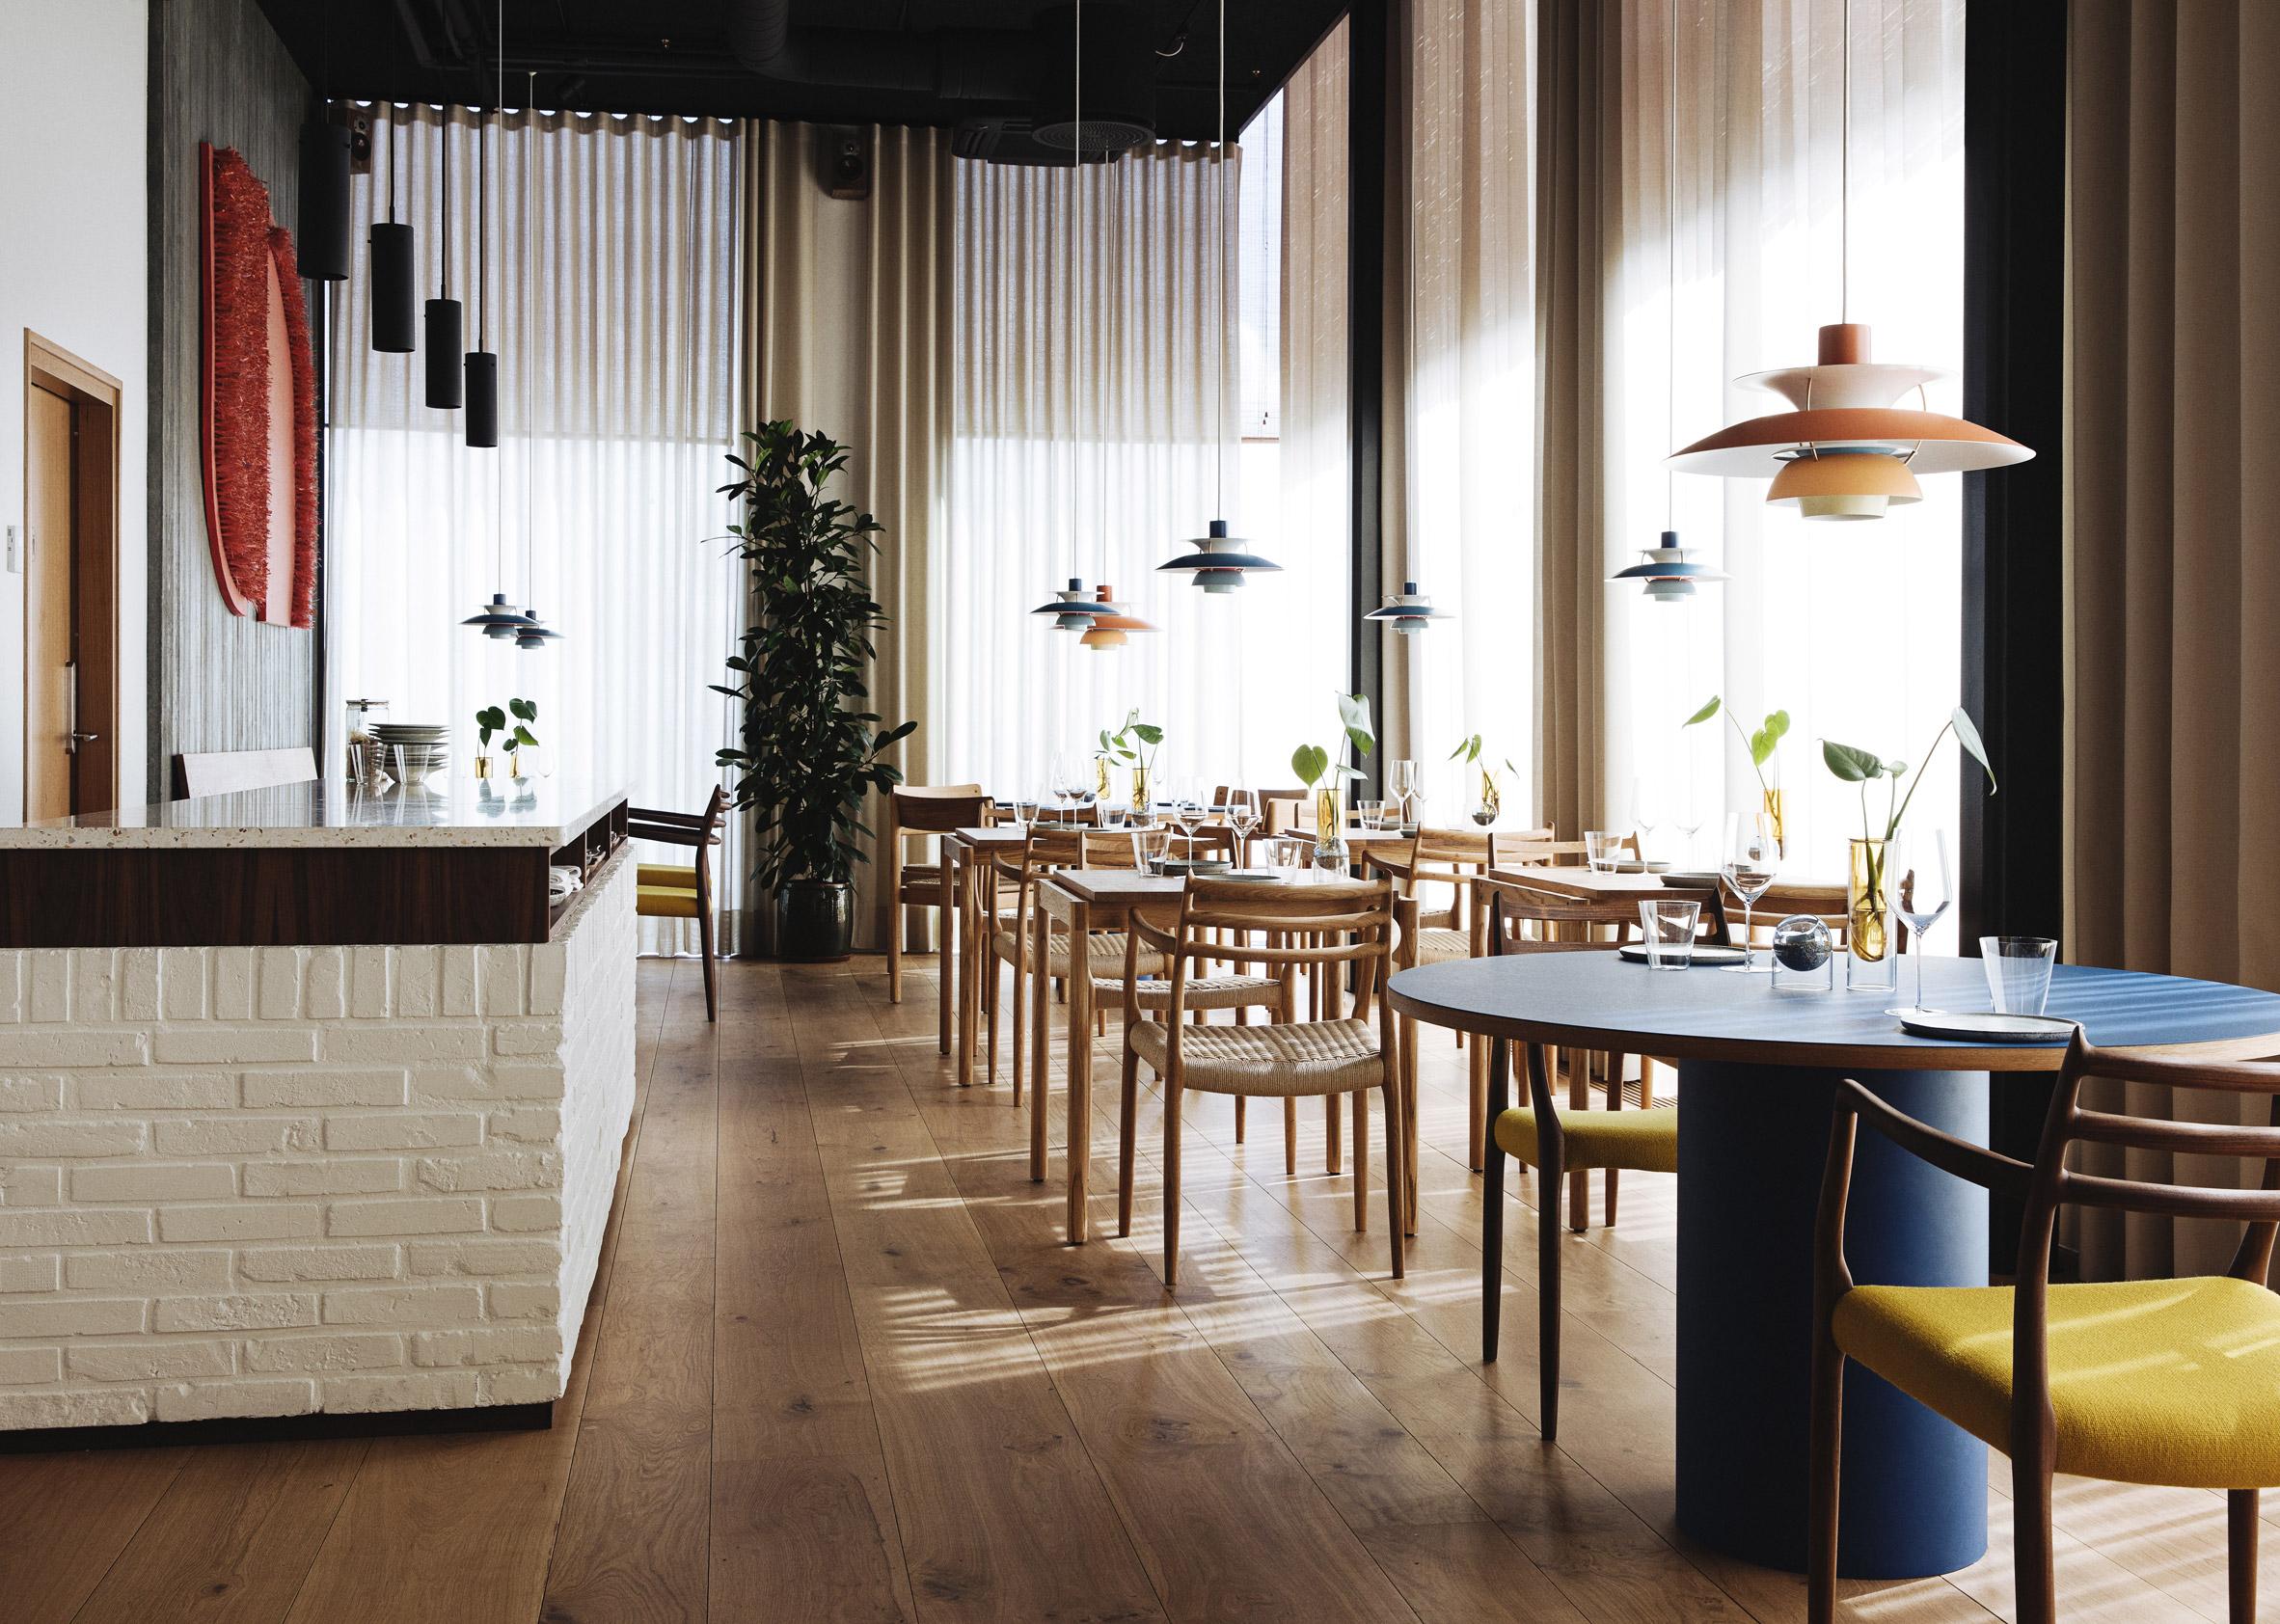 Interior of Substans restaurant in Aarhus by Krøyer & Gatten